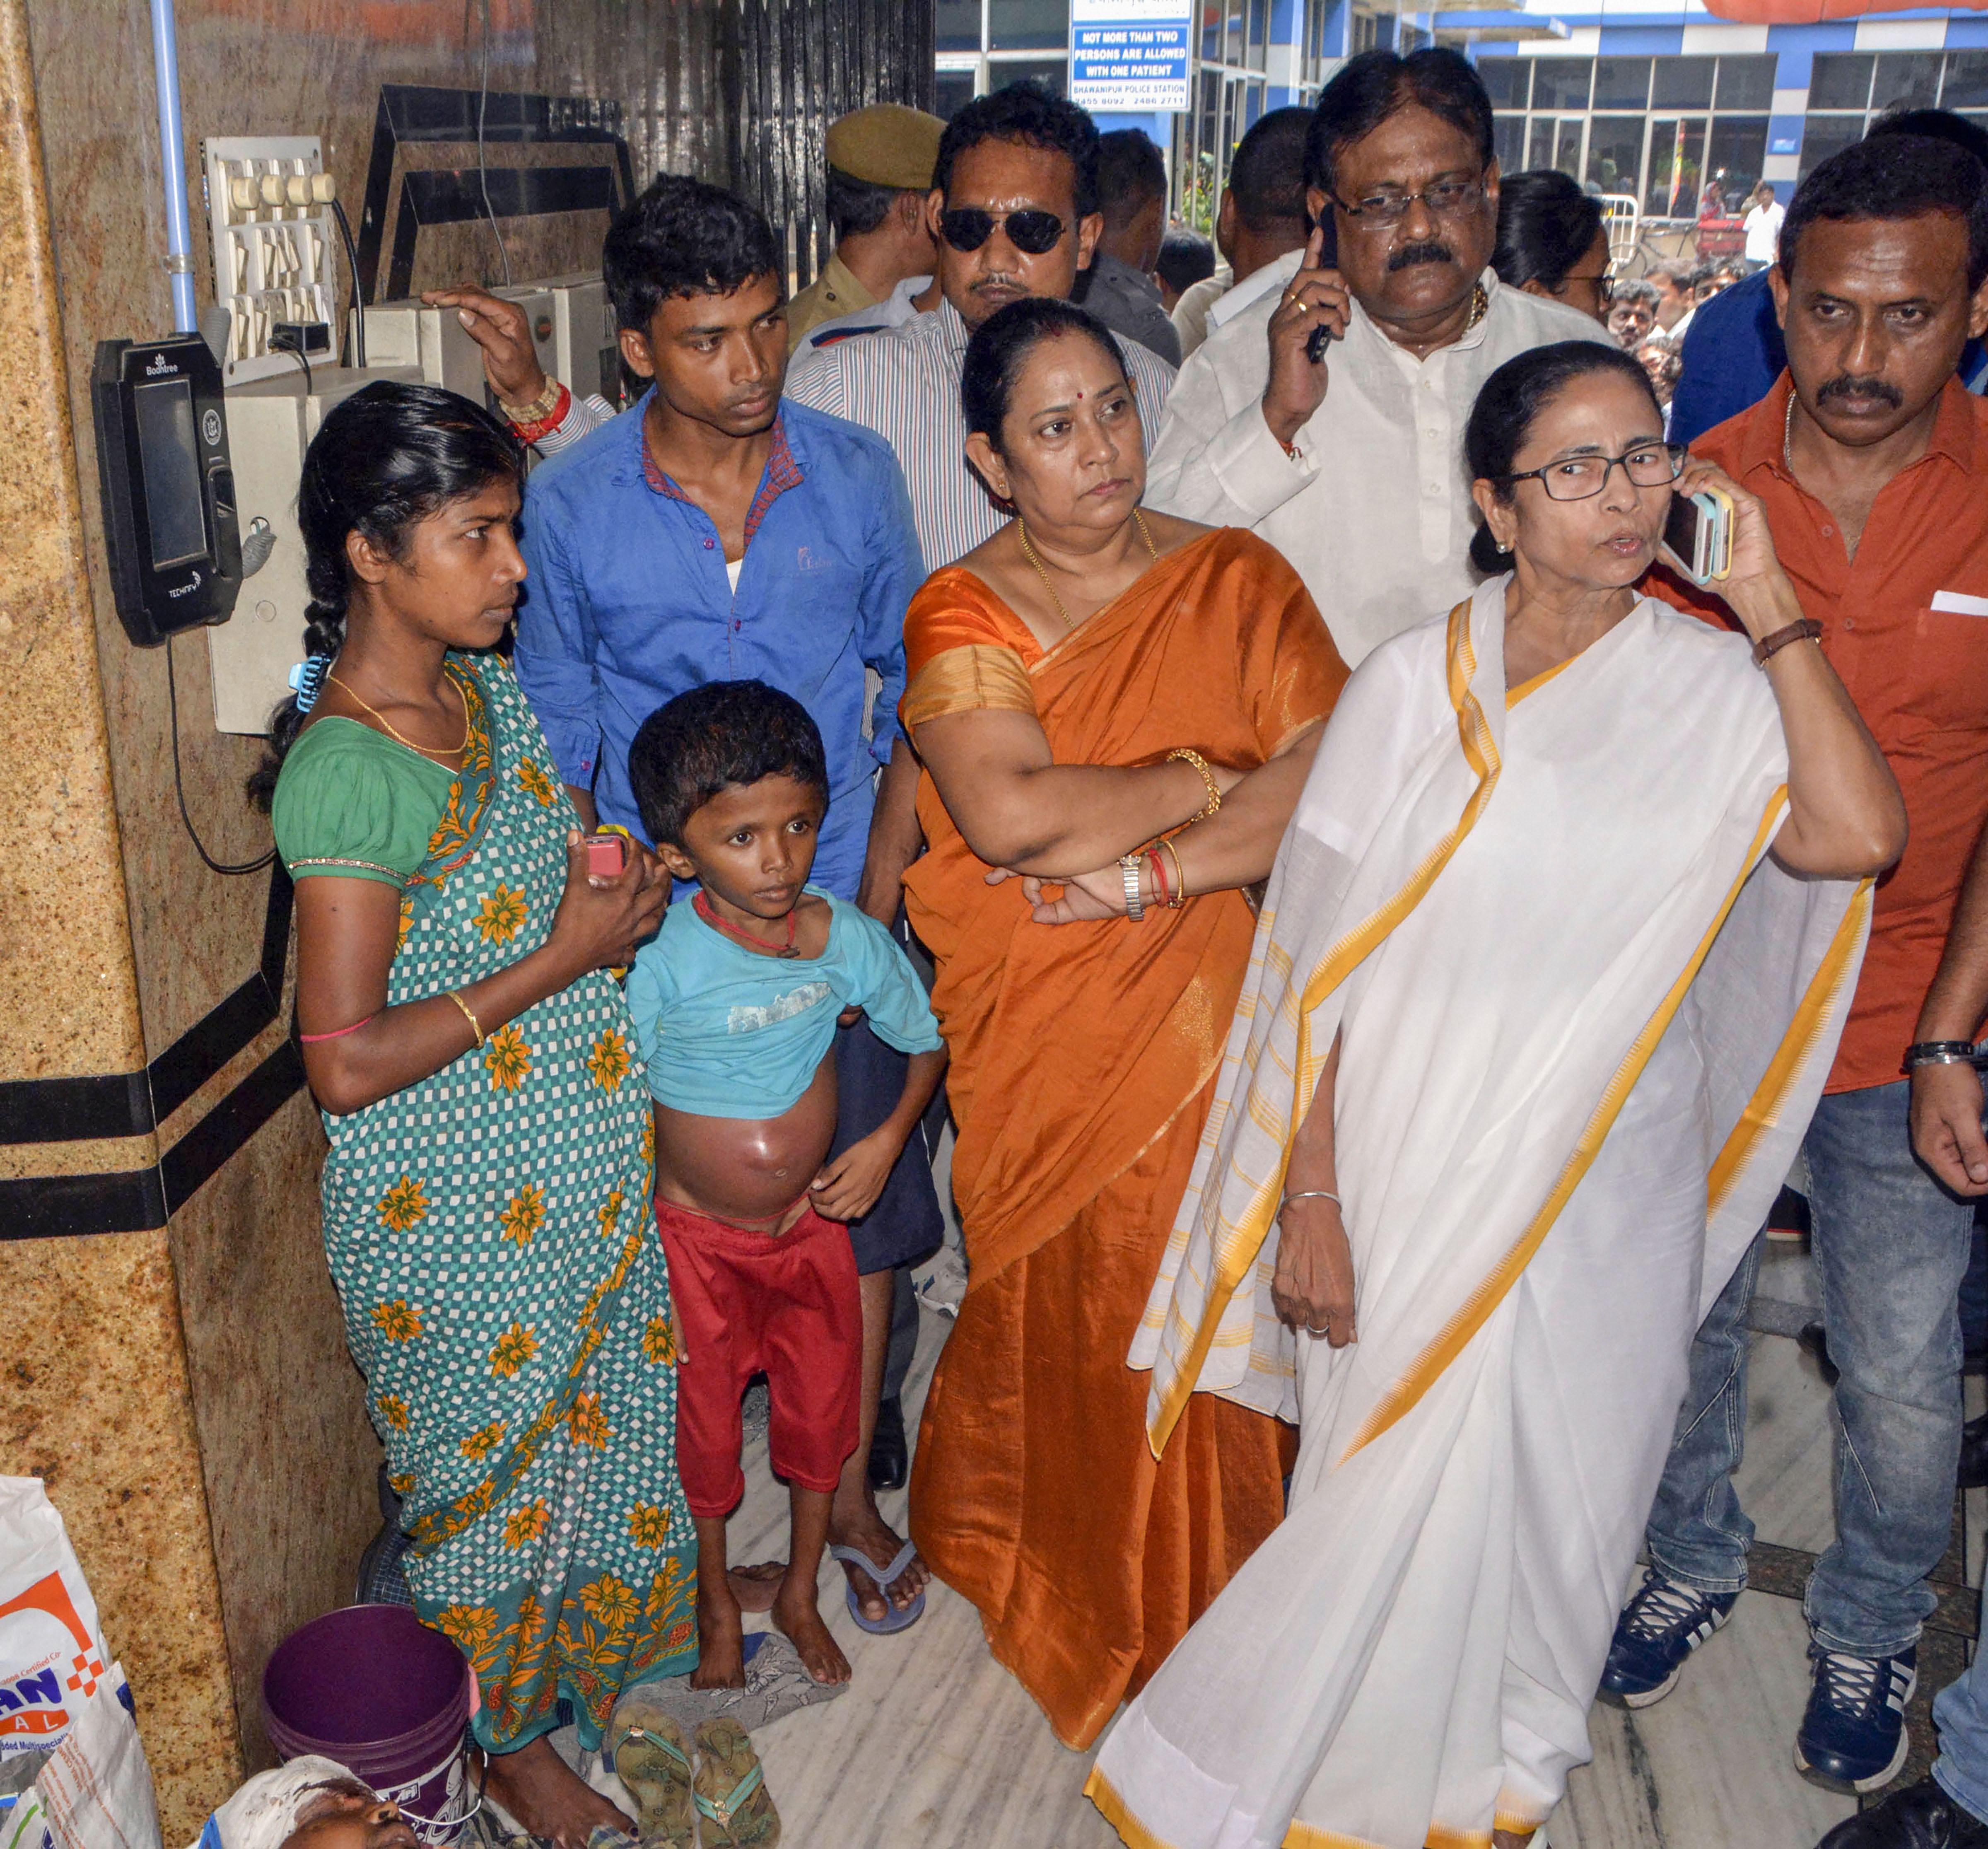 Mamata Banerjee at SSKM Hospital in Calcutta on Thursday.